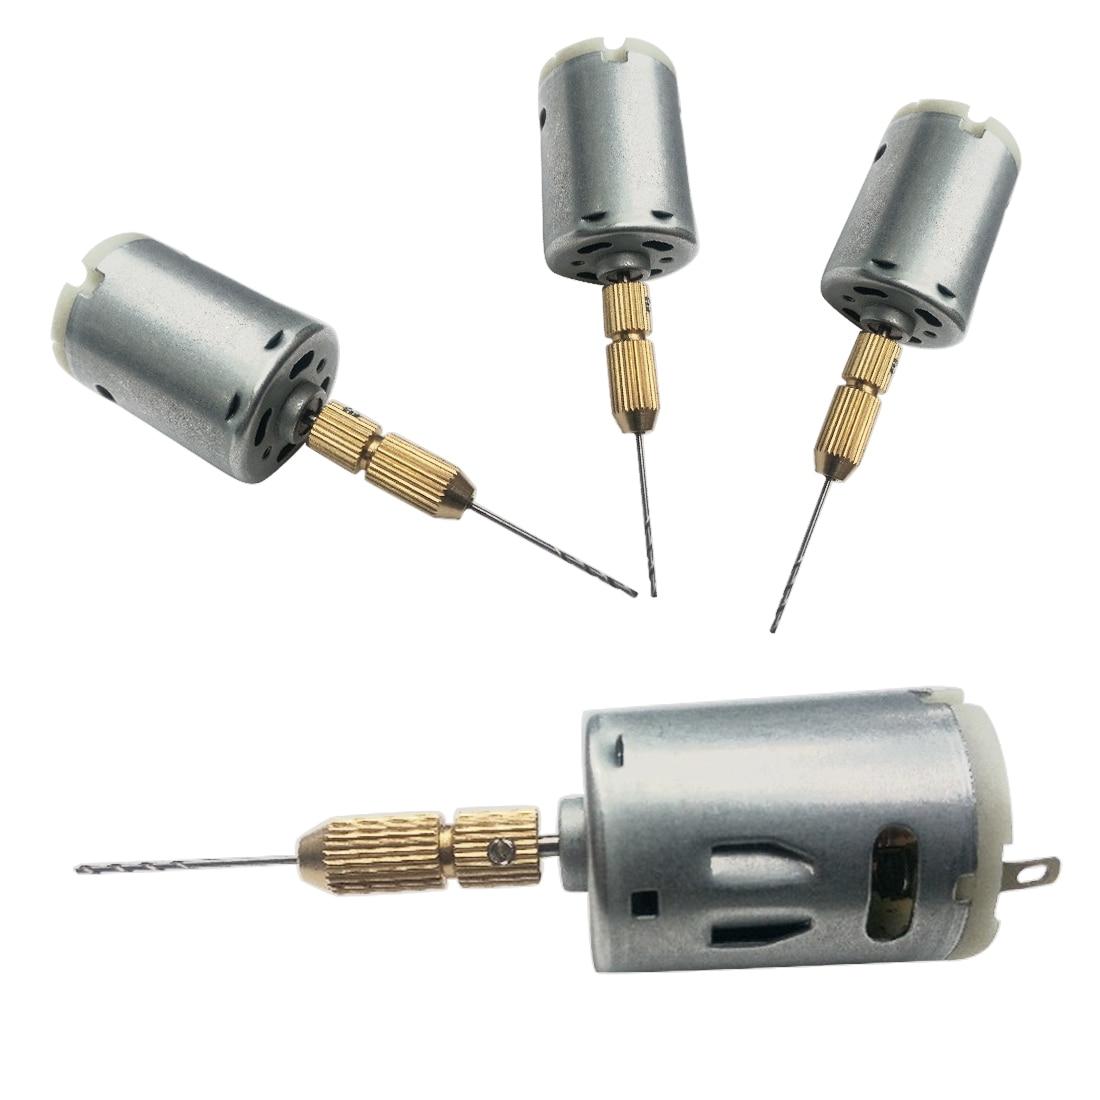 Hot 1pc High-quality JT0 Chucks Tool + 1pc DC 12V Electric Hand Drill Motor PCB Press Drilling Compact Set 1.0-1.5 Twist Bits